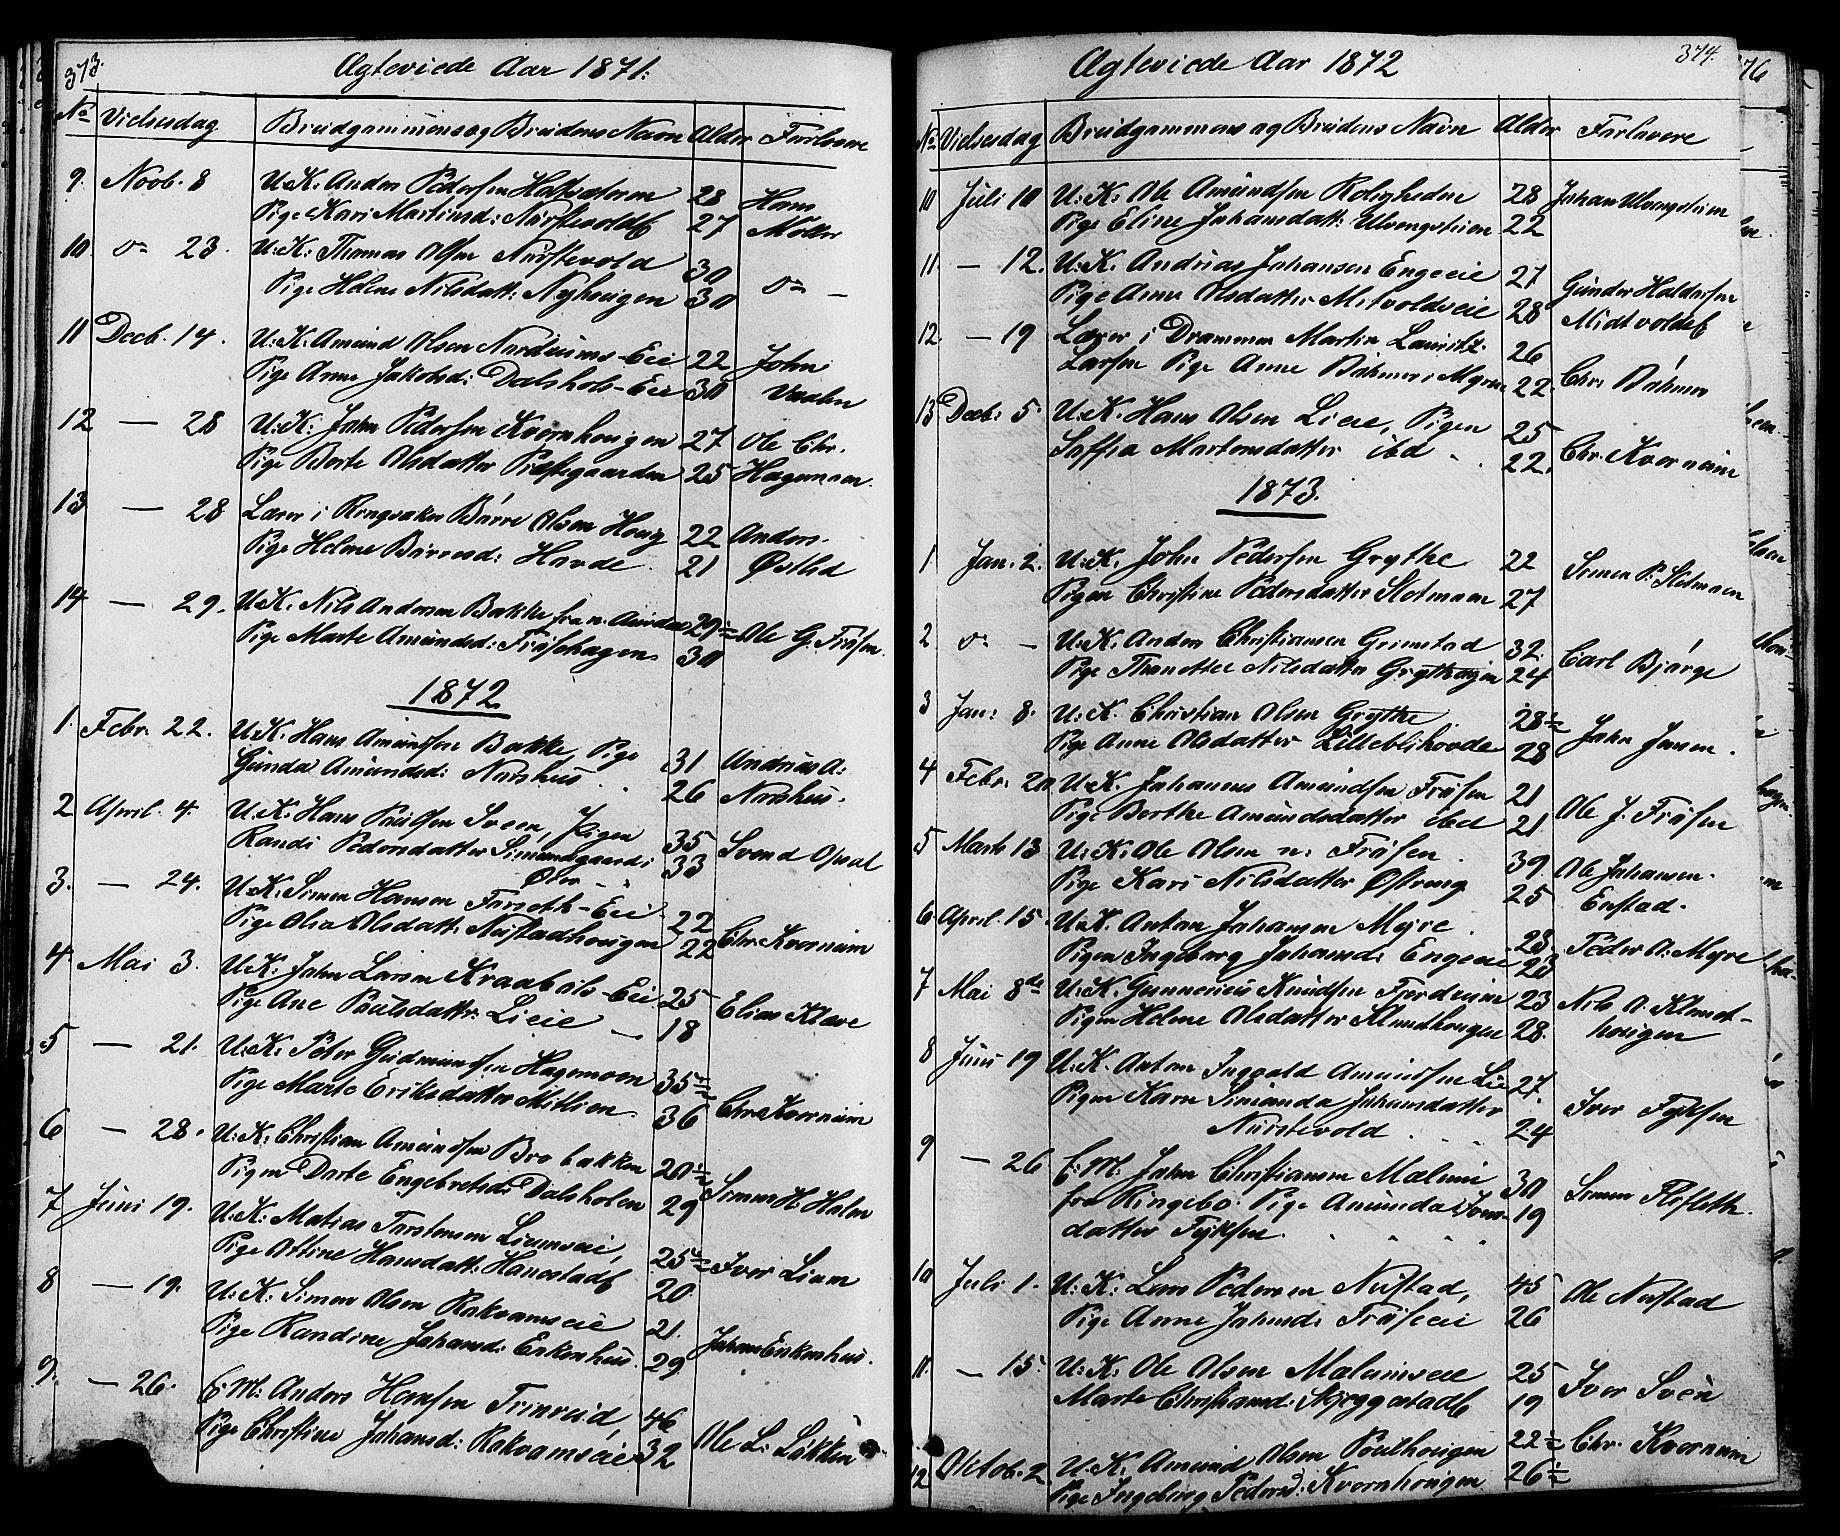 SAH, Østre Gausdal prestekontor, Klokkerbok nr. 1, 1863-1893, s. 373-374